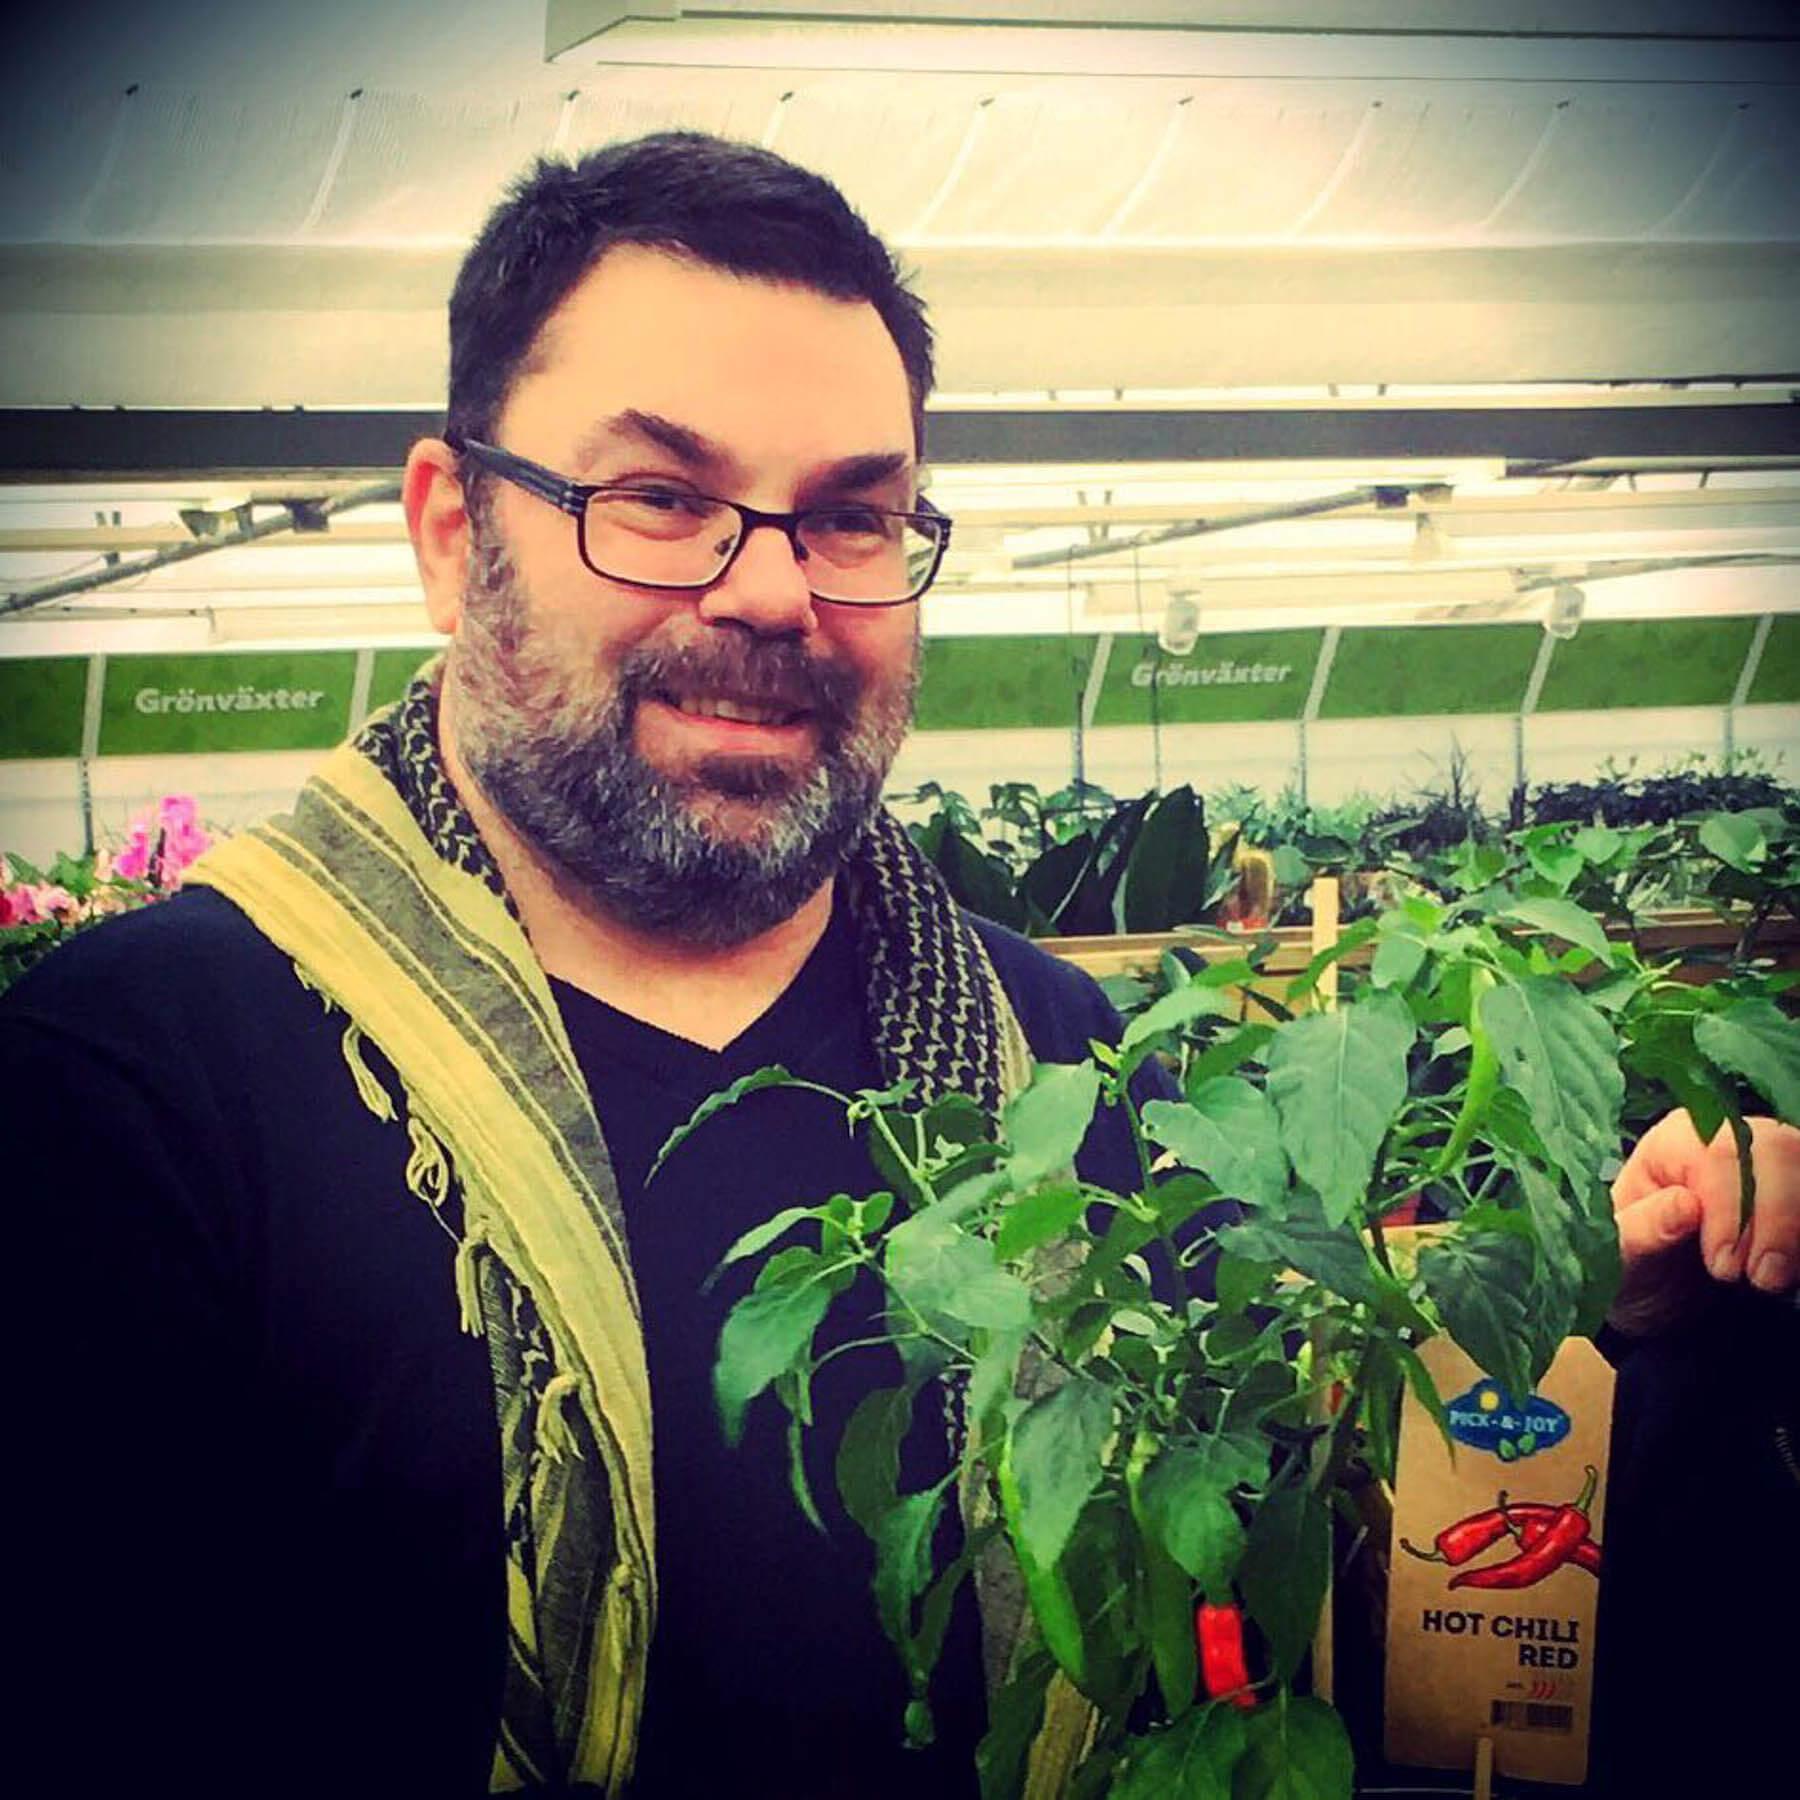 Christian Gilensparr från Westkust Chili ser ut att må gott bland alla chiliplantor.